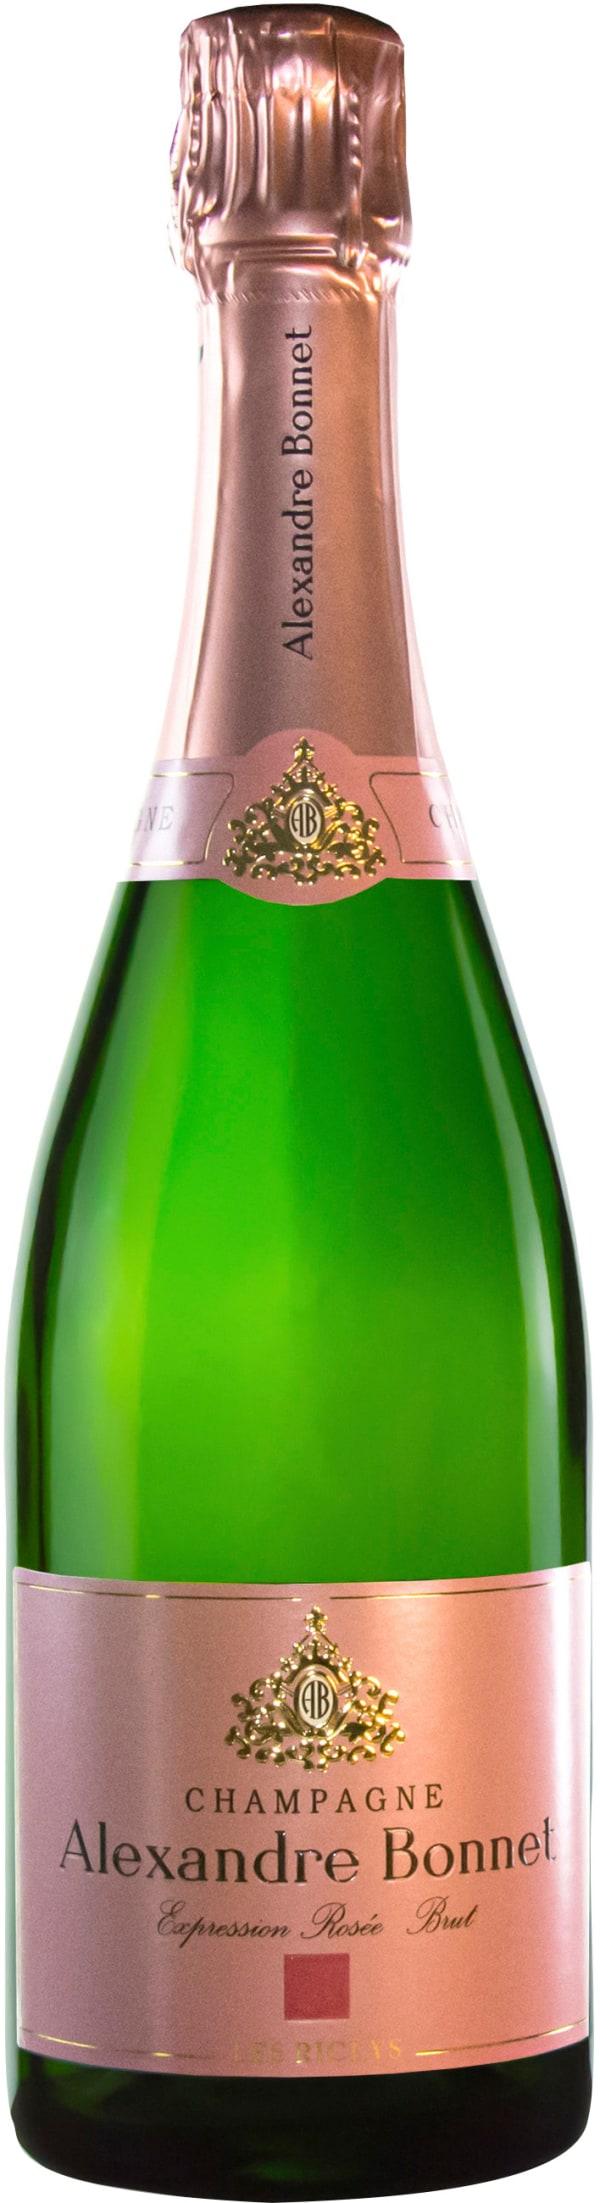 Alexandre Bonnet Expression Rosée Champagne Brut